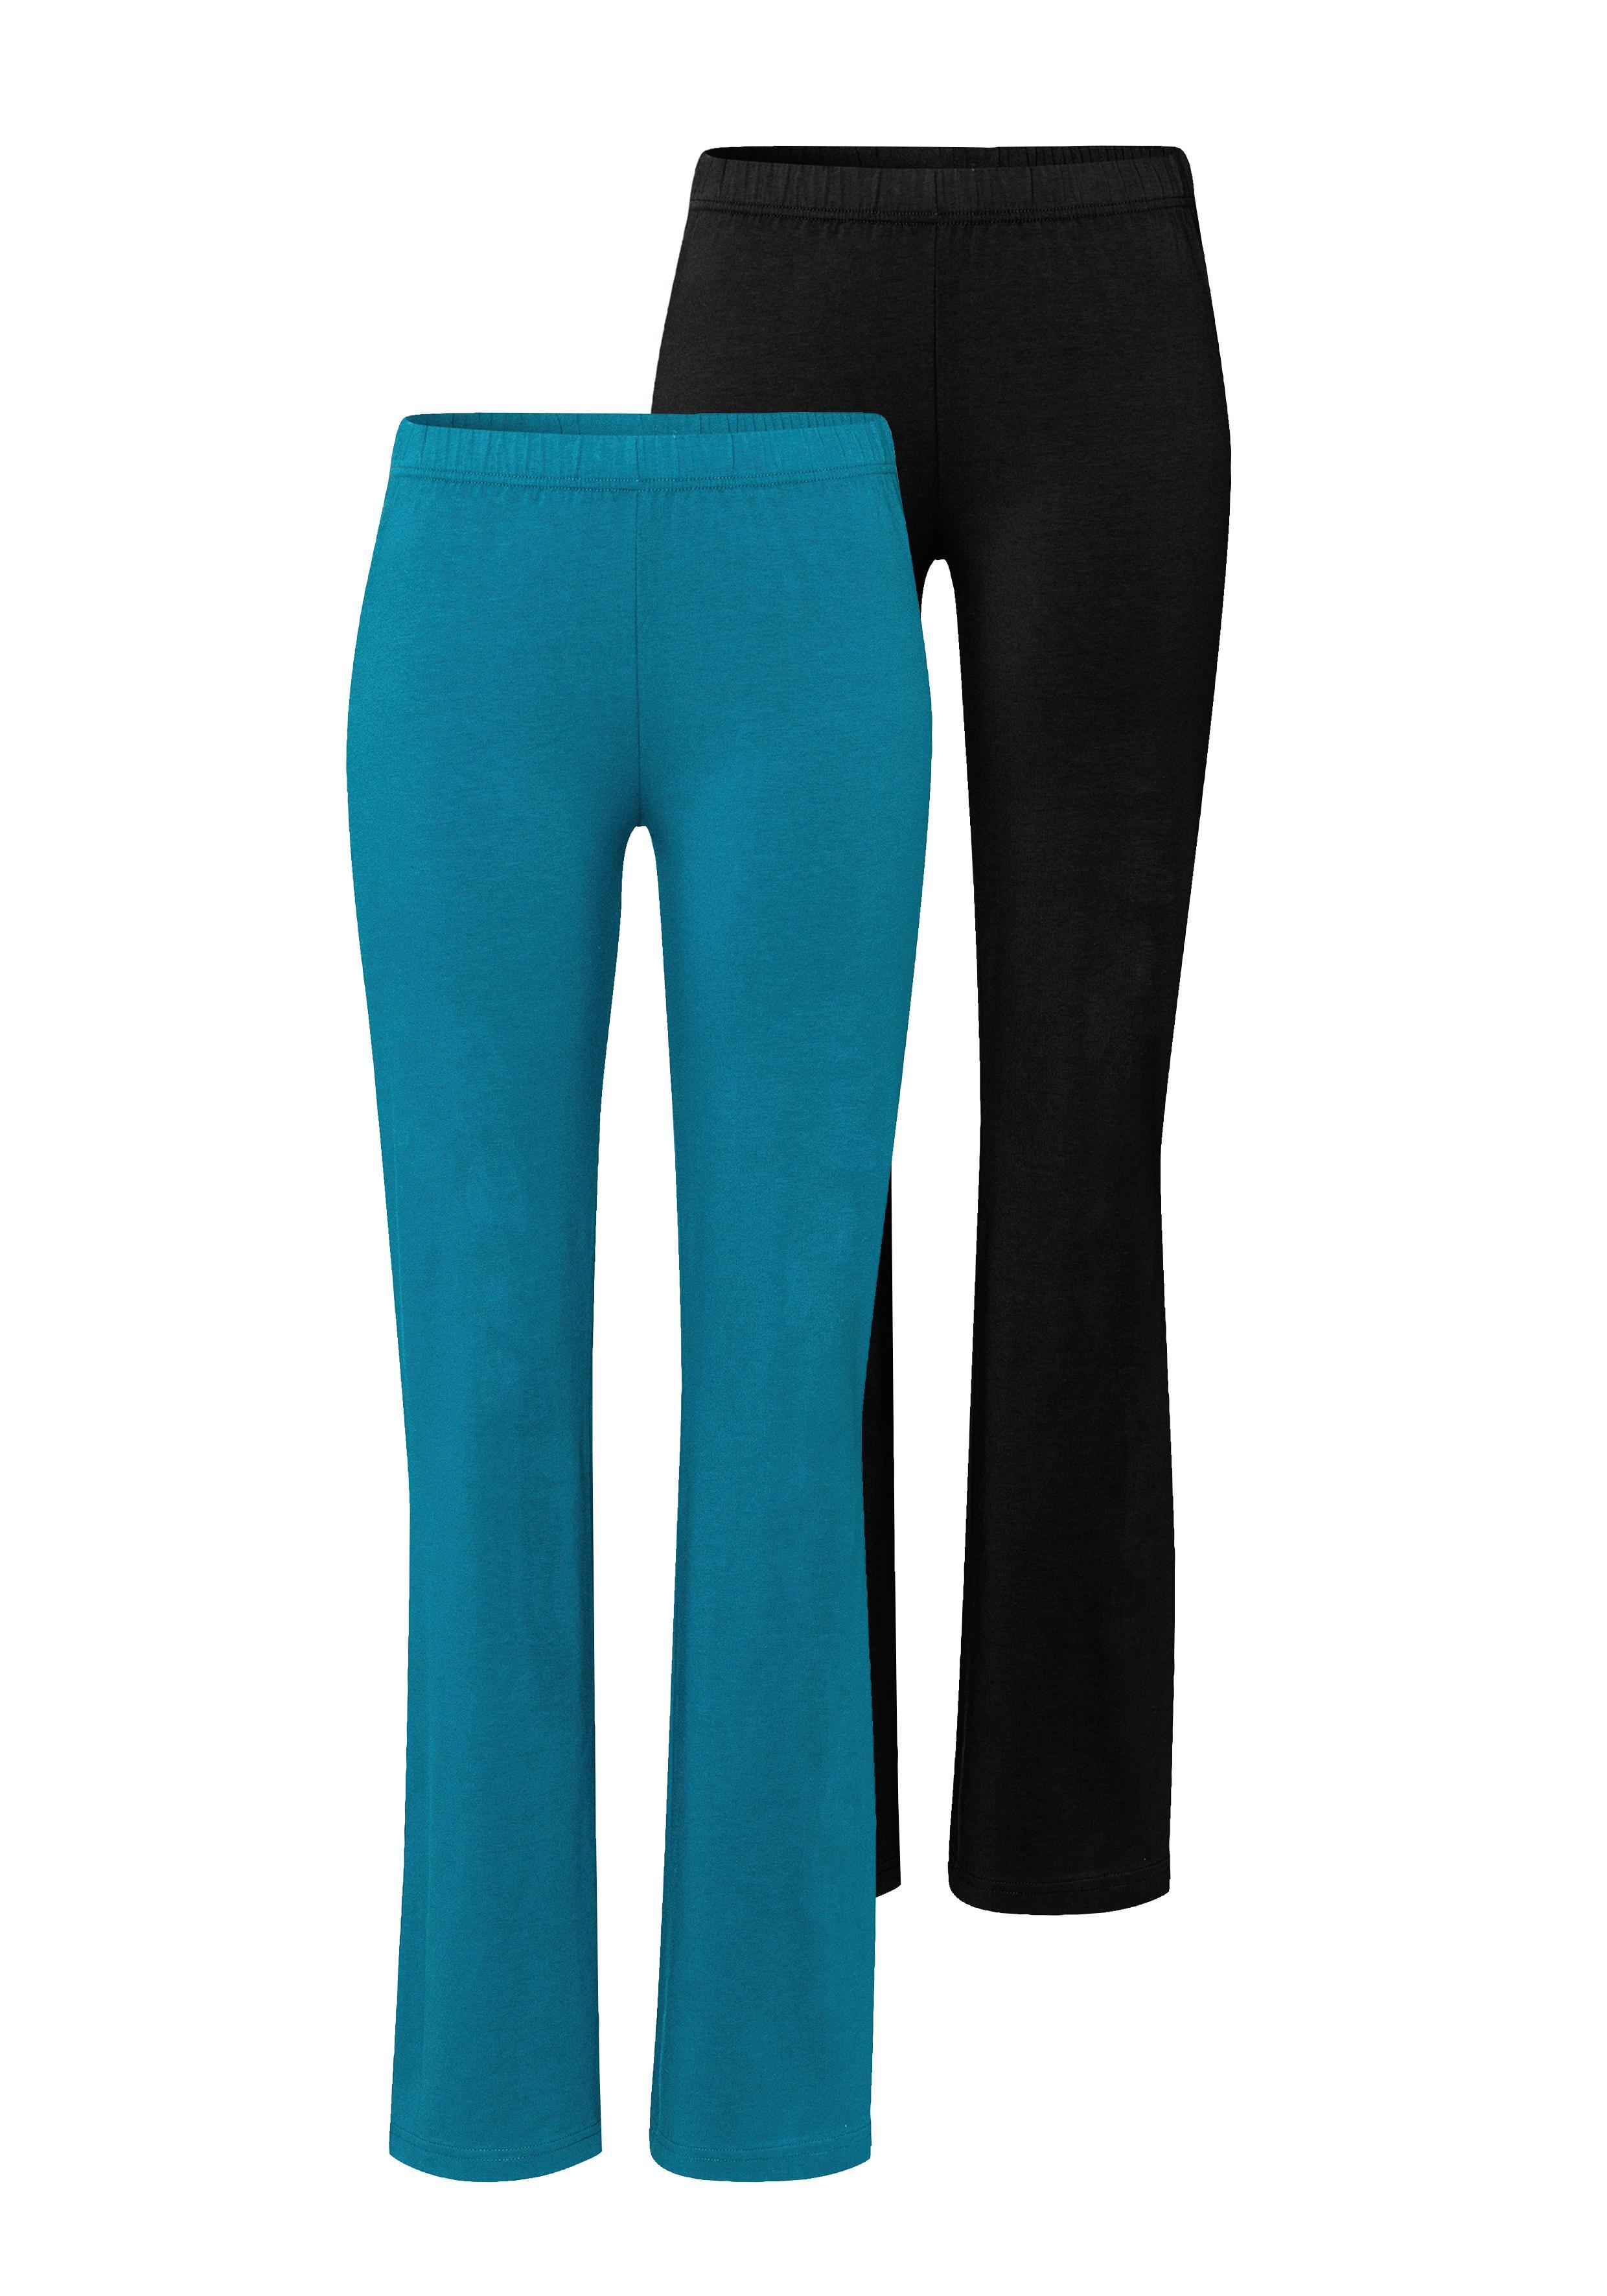 Vivance Jazzpants   Bekleidung > Homewear > Leggings   Grün   Vivance